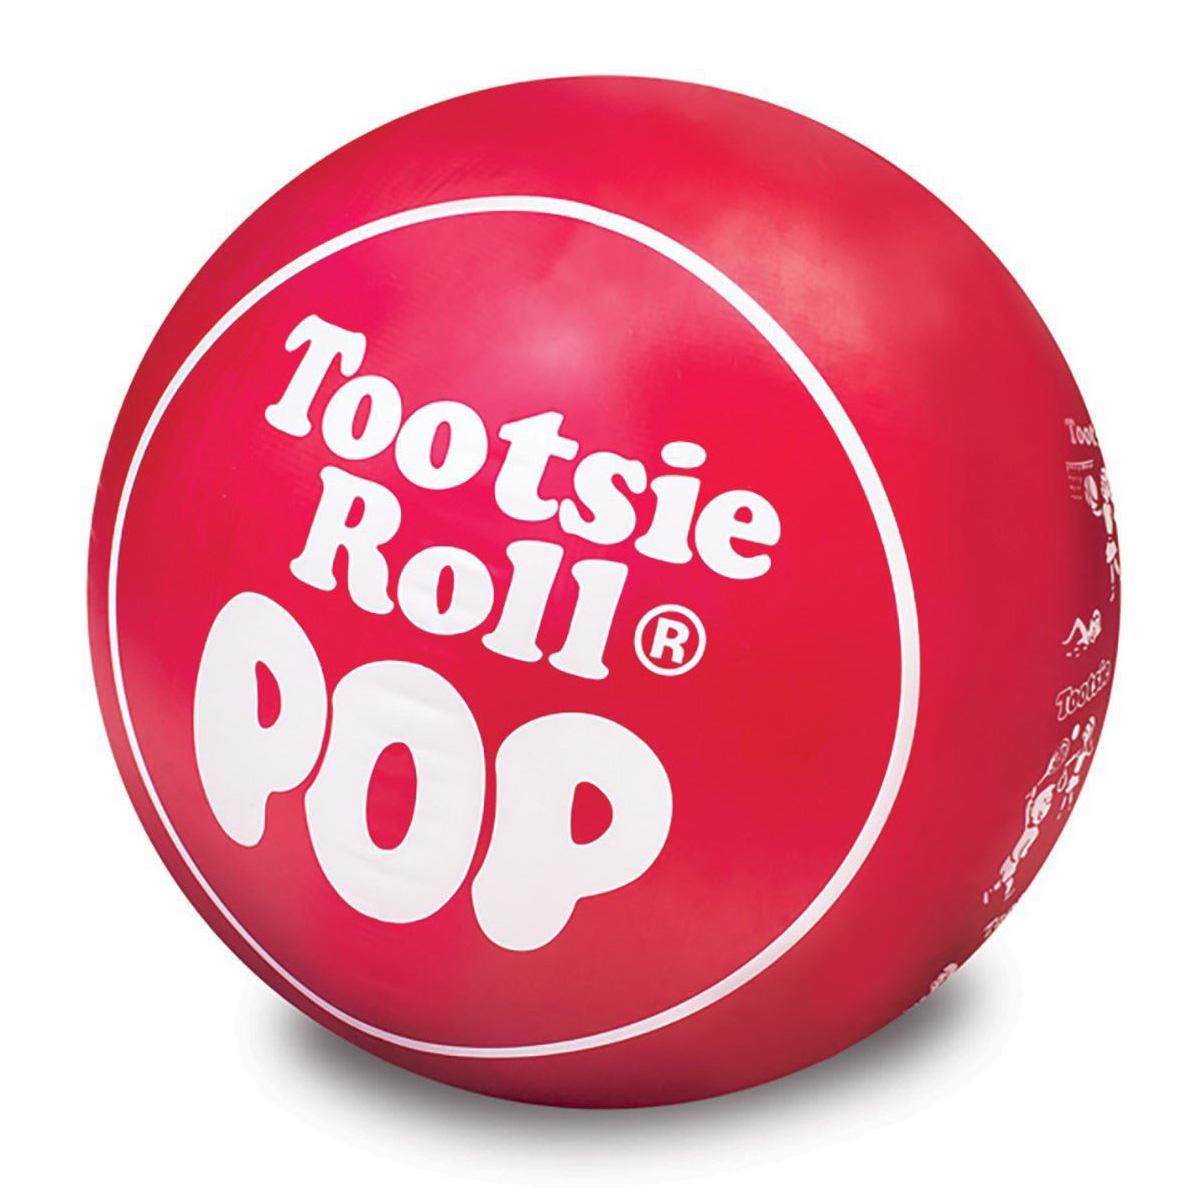 Gigantic Tootsie Roll Pop Beach Ball The Green Head